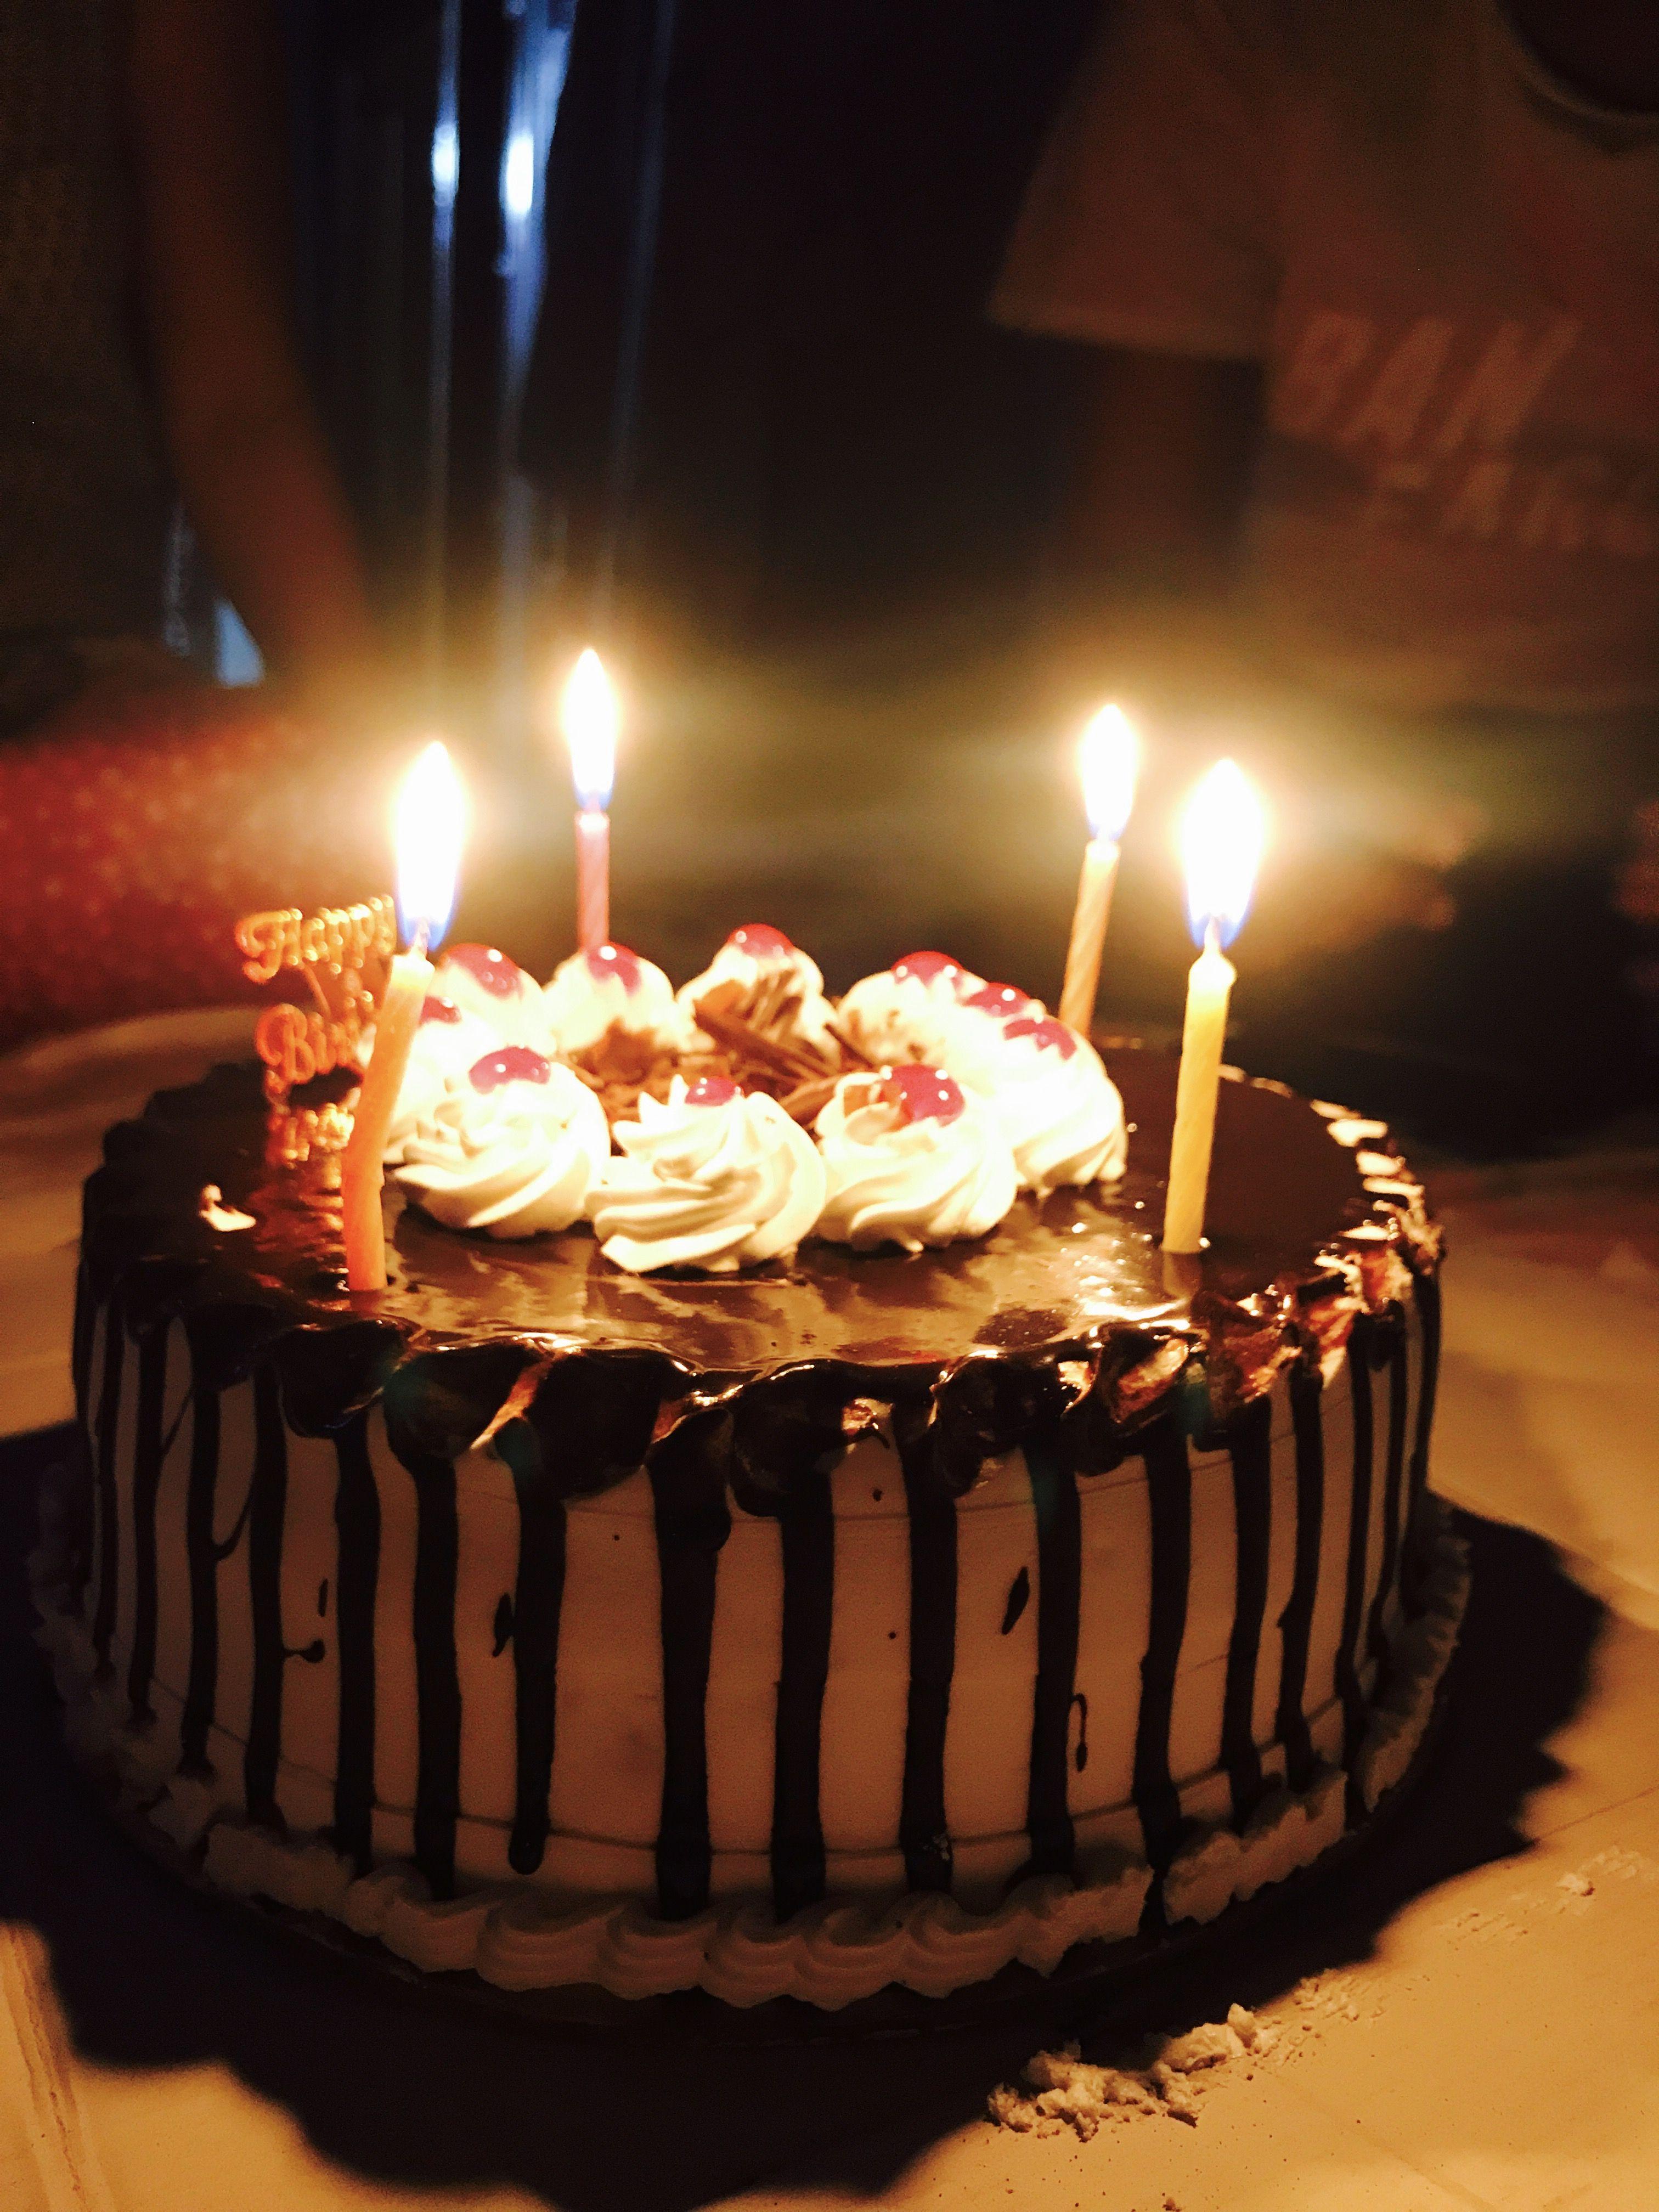 Outstanding Pinterest Kubra Yousuf Happy Birthday Chocolate Cake Food Funny Birthday Cards Online Barepcheapnameinfo